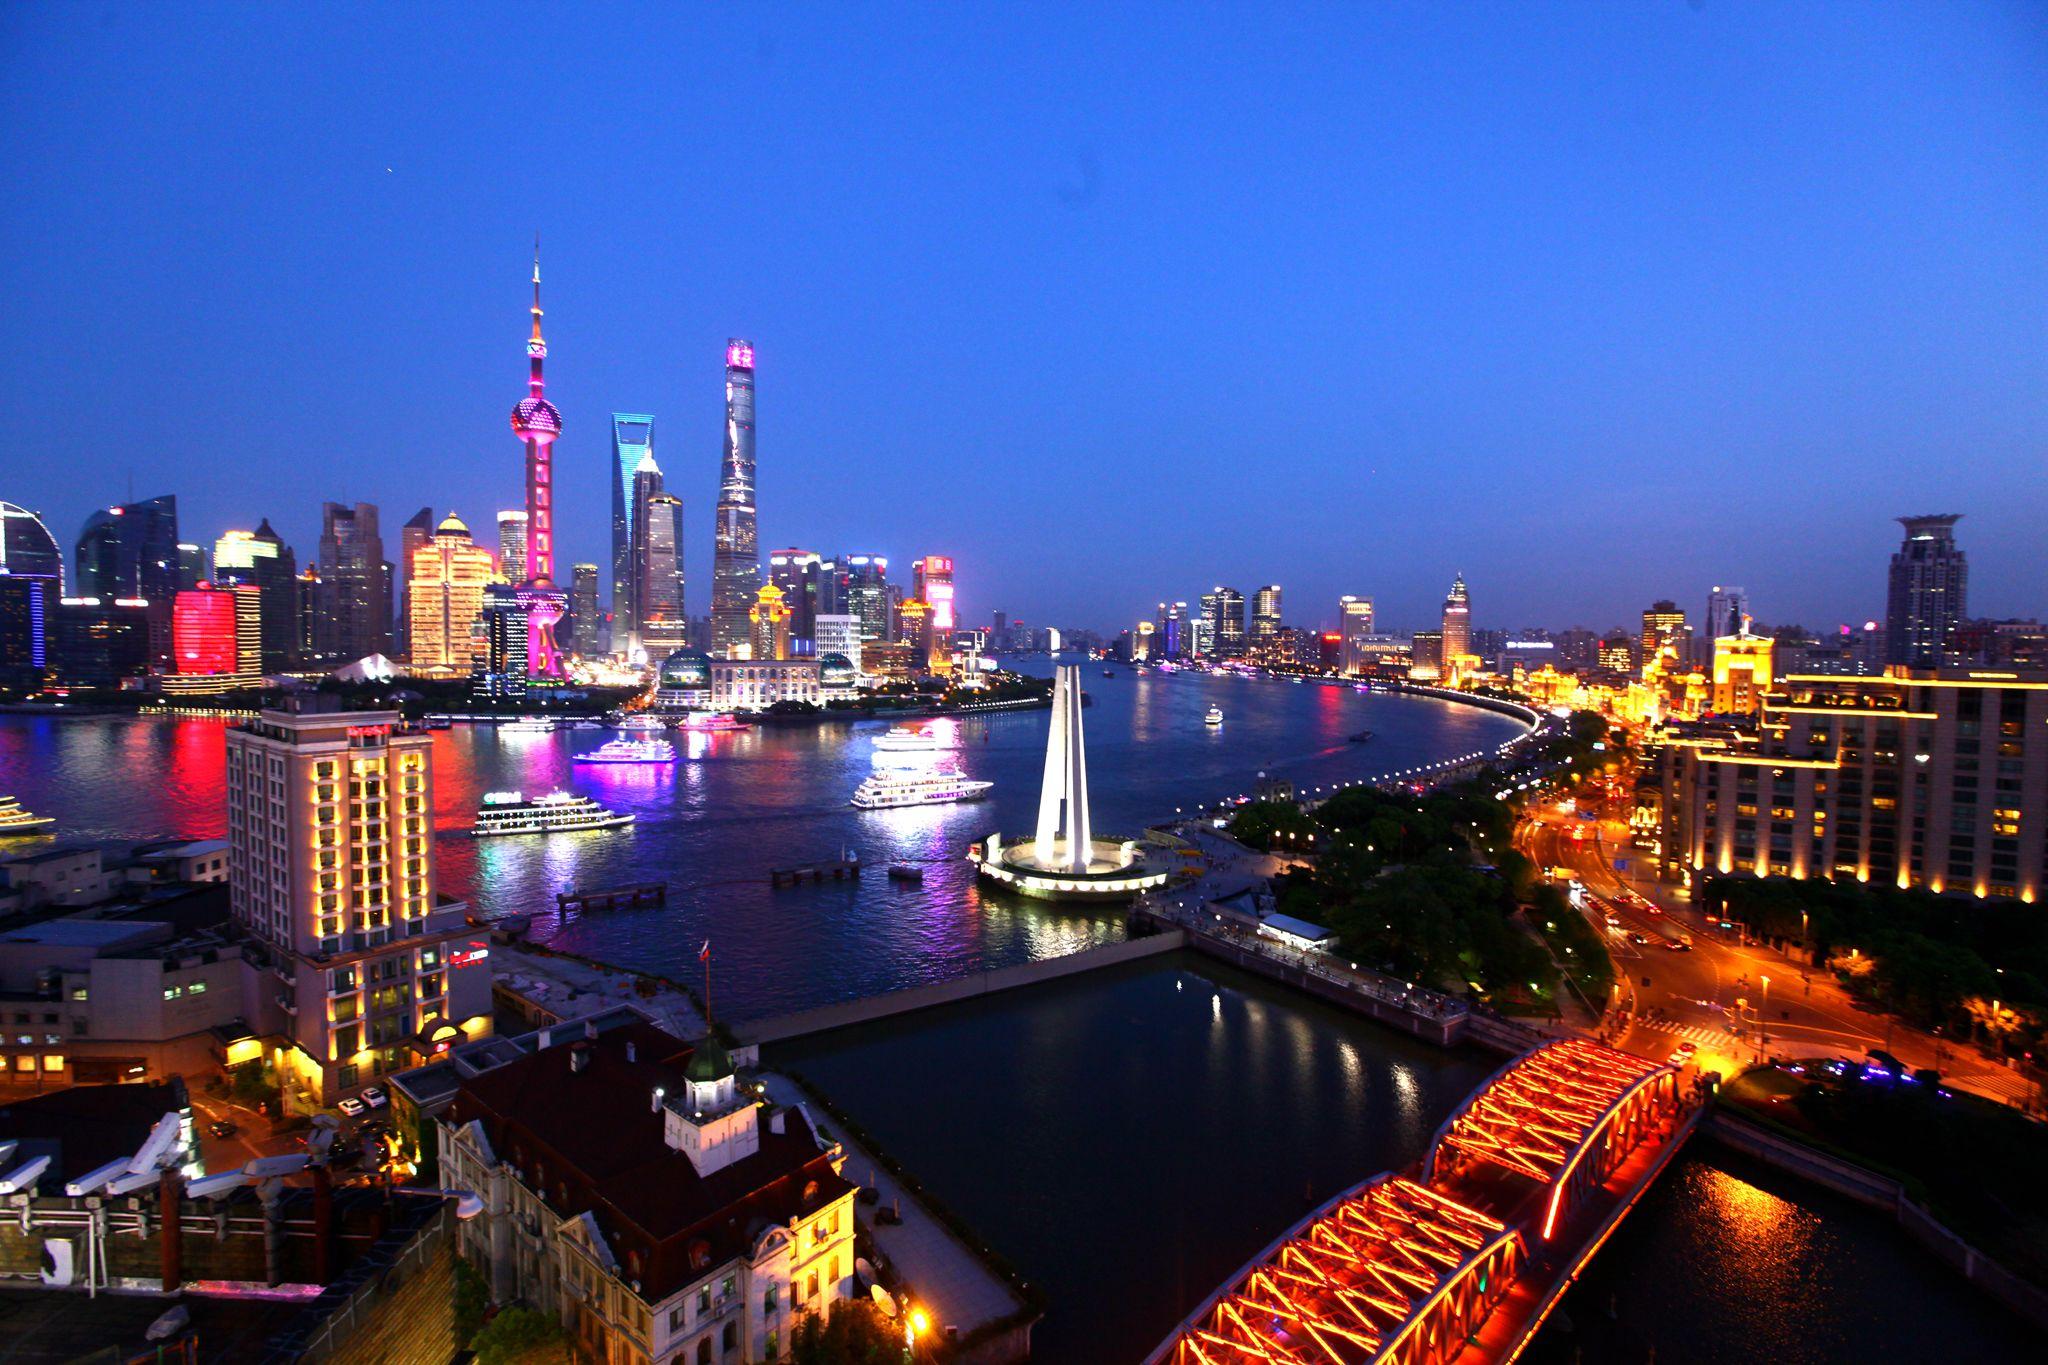 Evening City Lights & Huangpu River Cruise Coach Tour